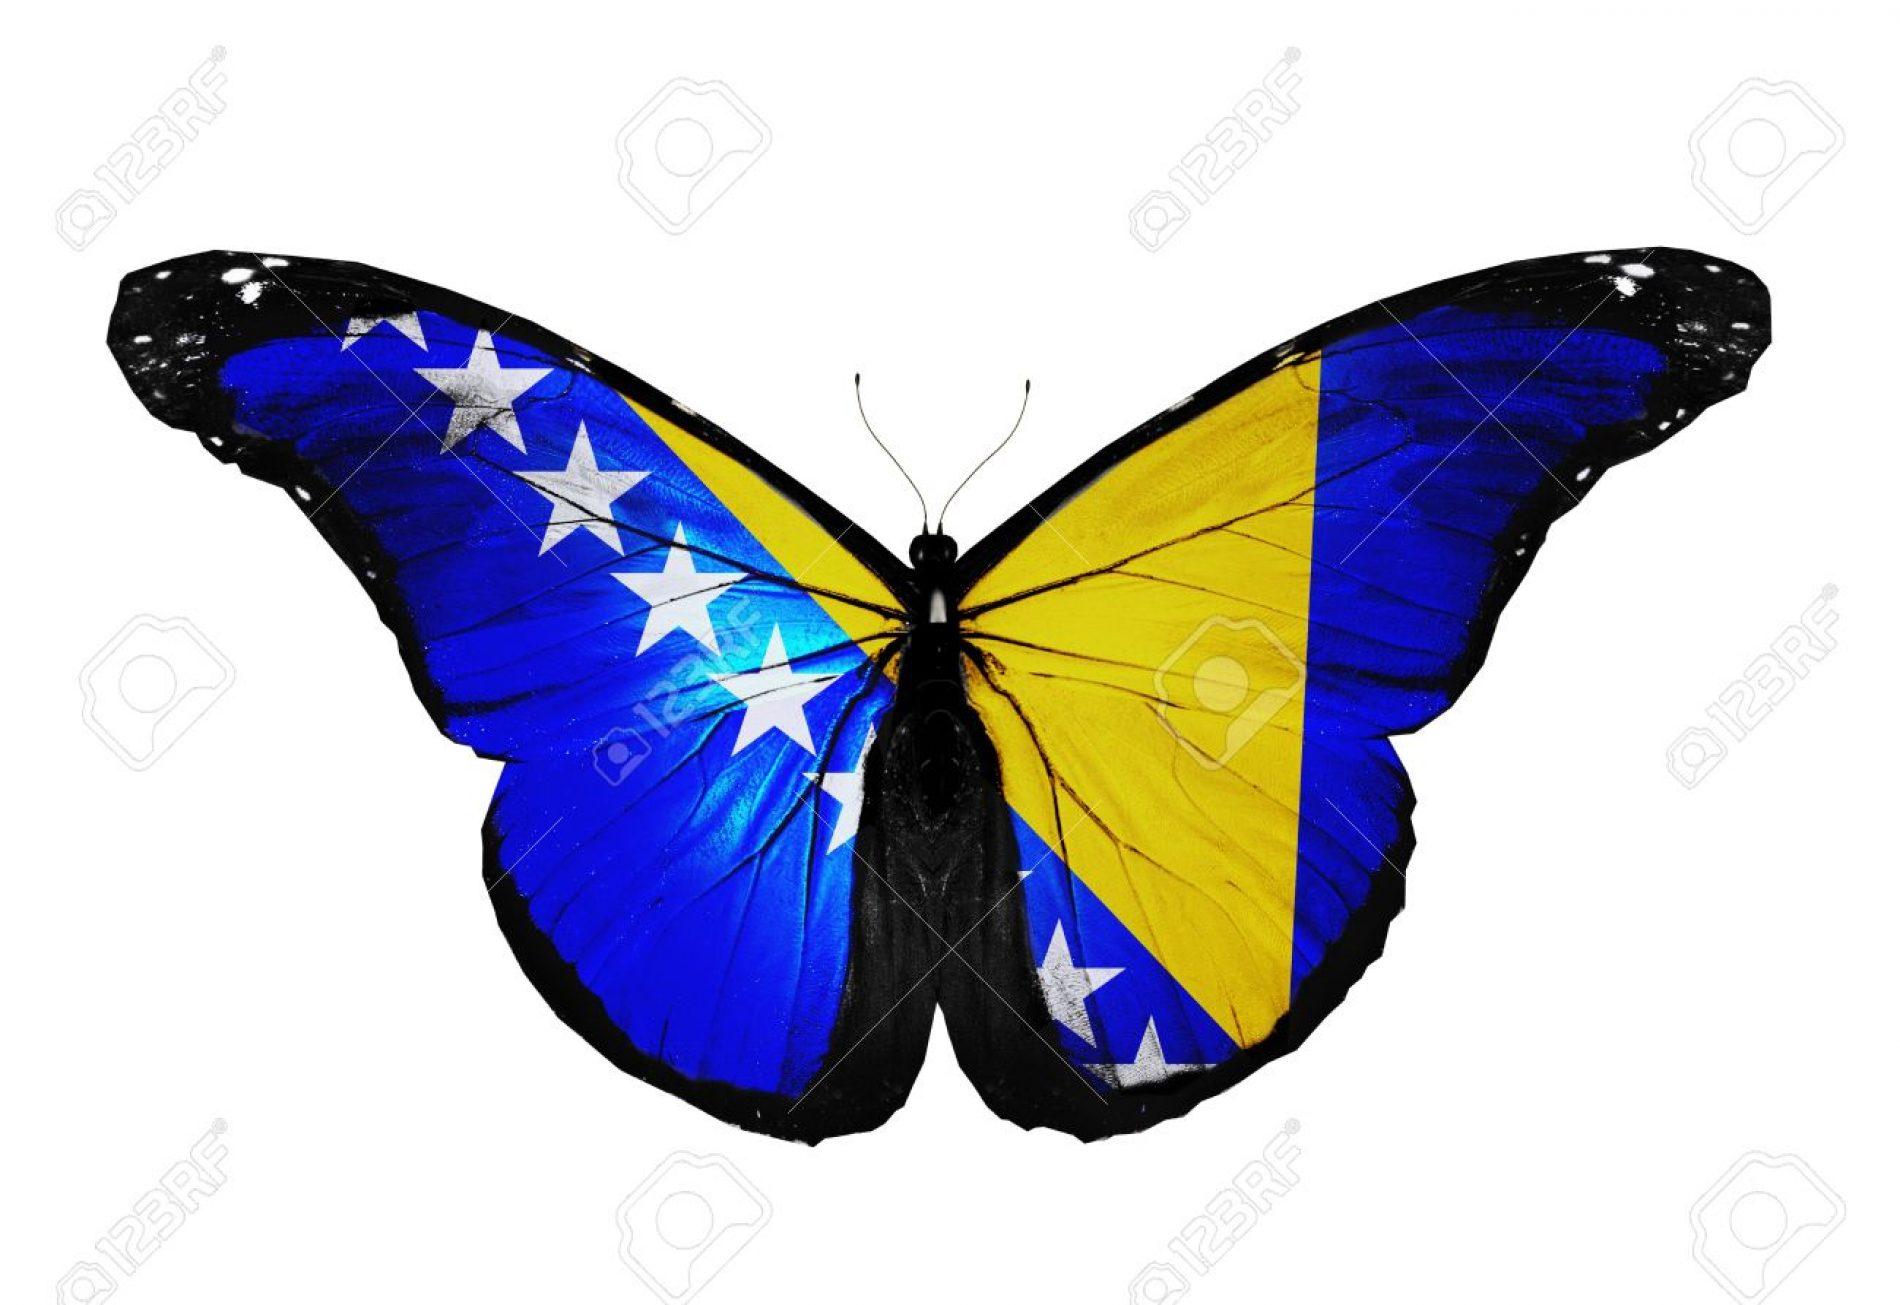 Sloboda medija: Bosna i Hercegovina najbolja na Balkanu